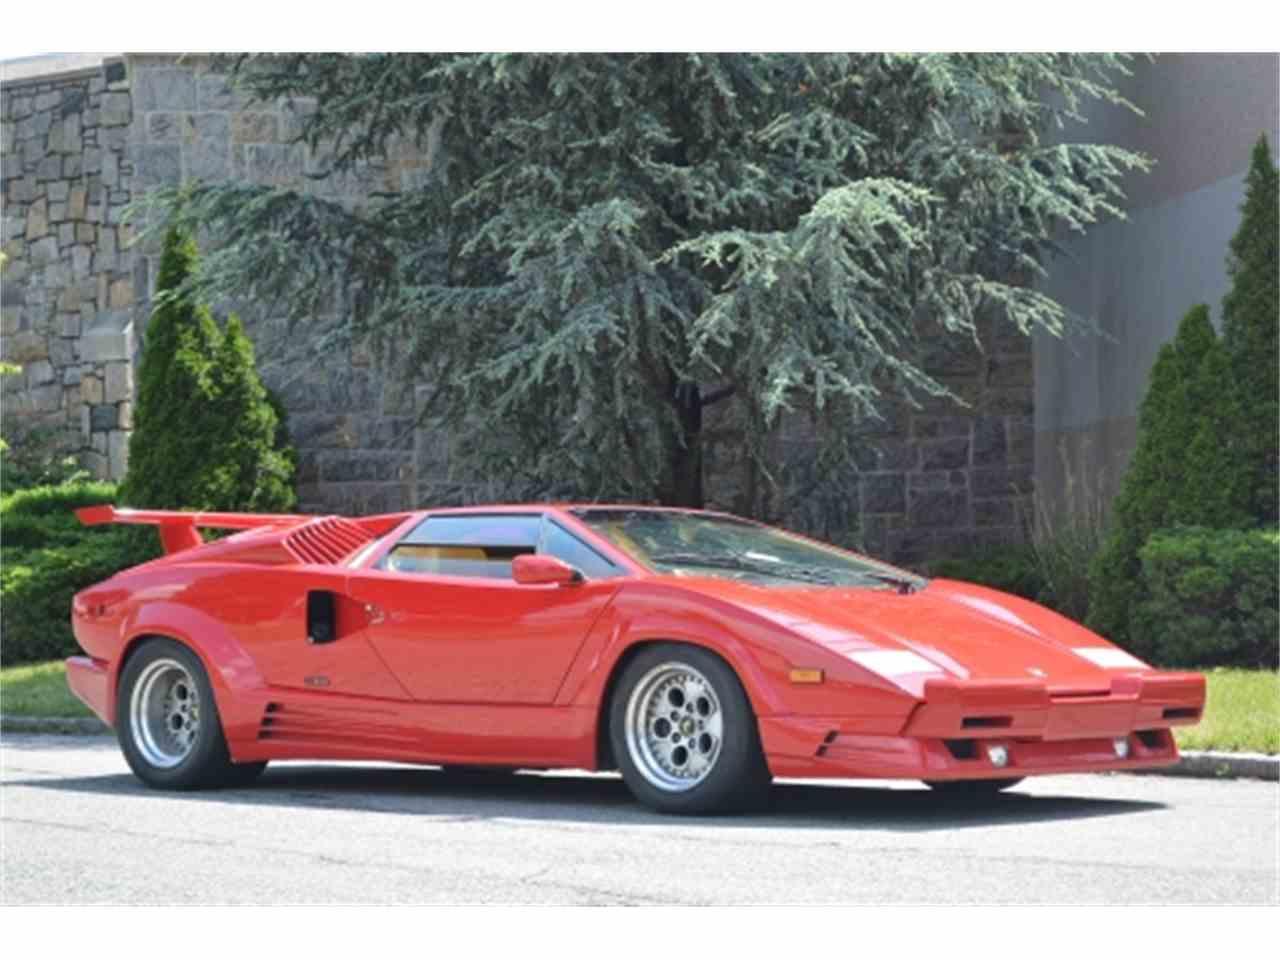 1989 Lamborghini Countach For Sale Classiccars Com Cc